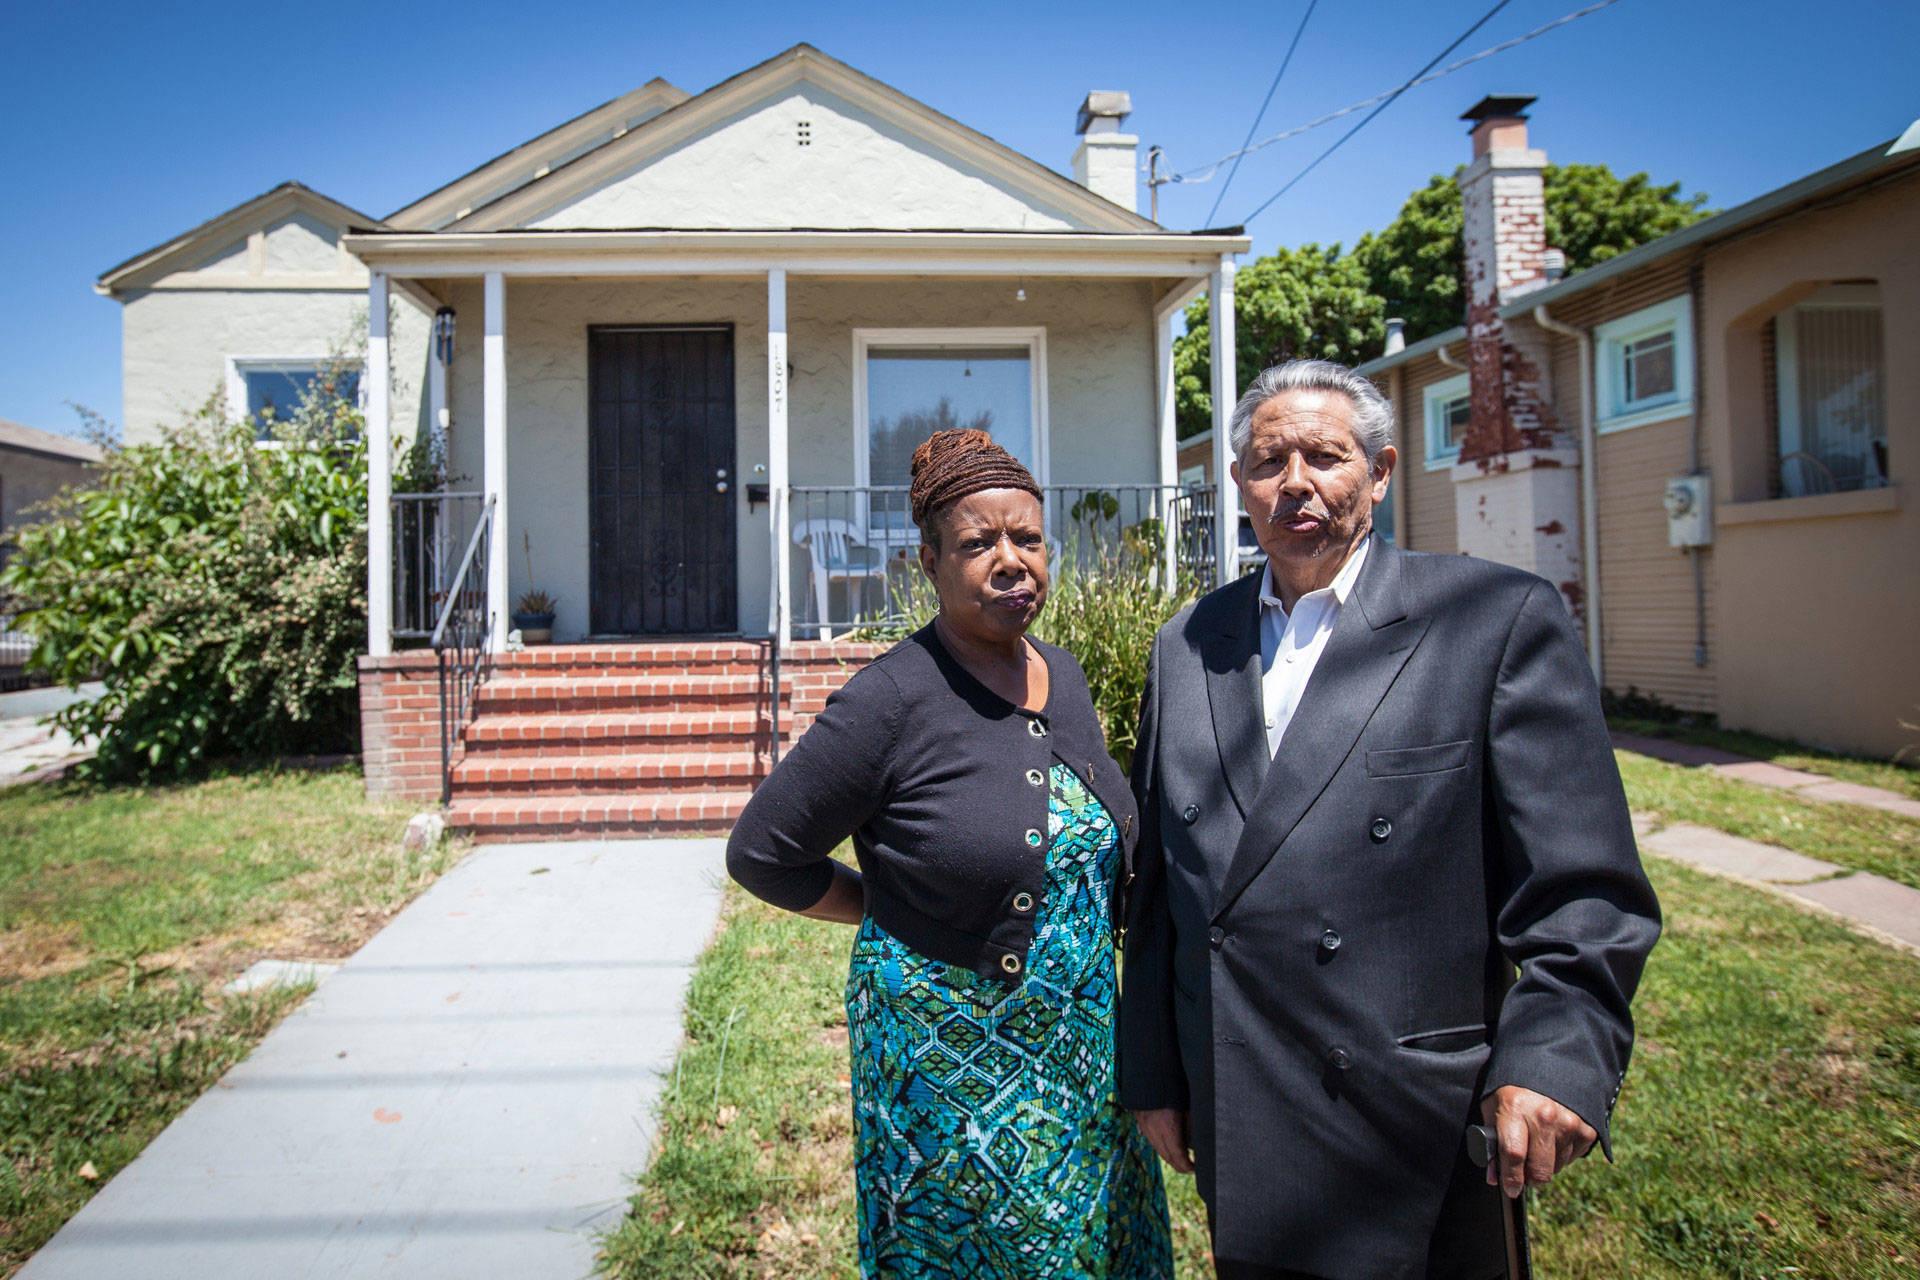 Vanessa and Richard Bulnes still long for their old home in East Oakland. Deborah Svoboda/KQED